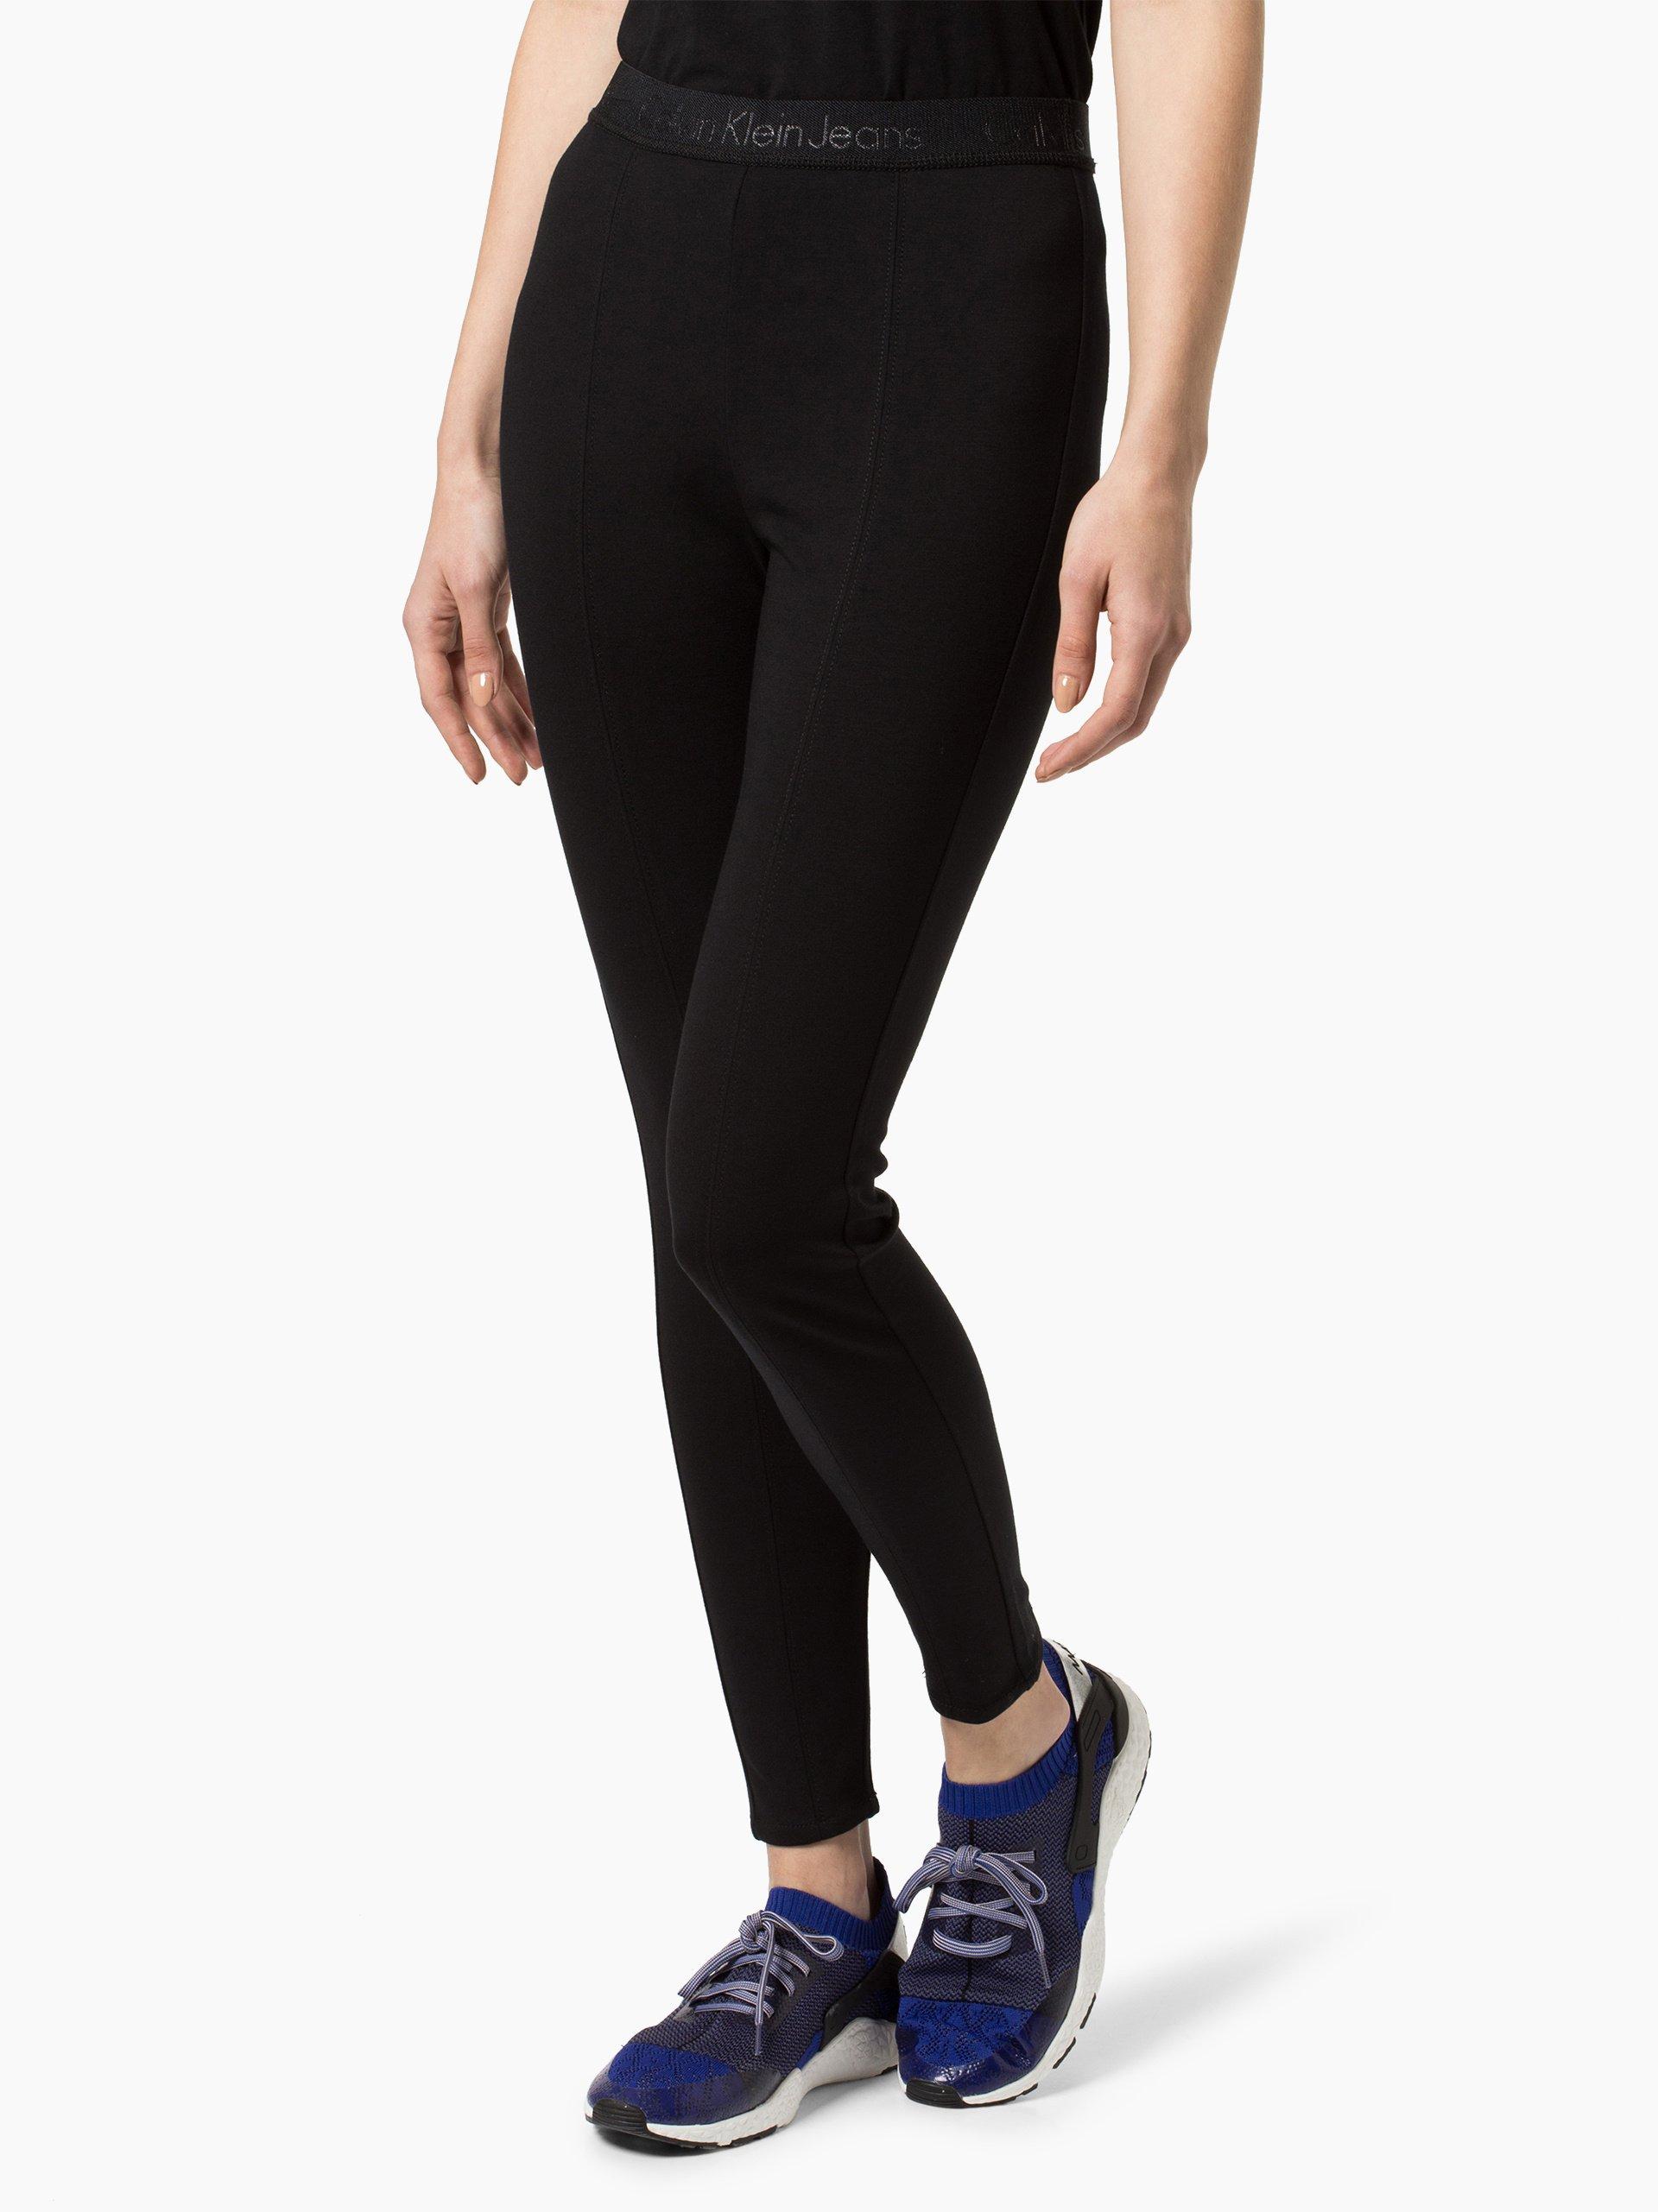 calvin klein jeans damen hose schwarz uni online kaufen. Black Bedroom Furniture Sets. Home Design Ideas